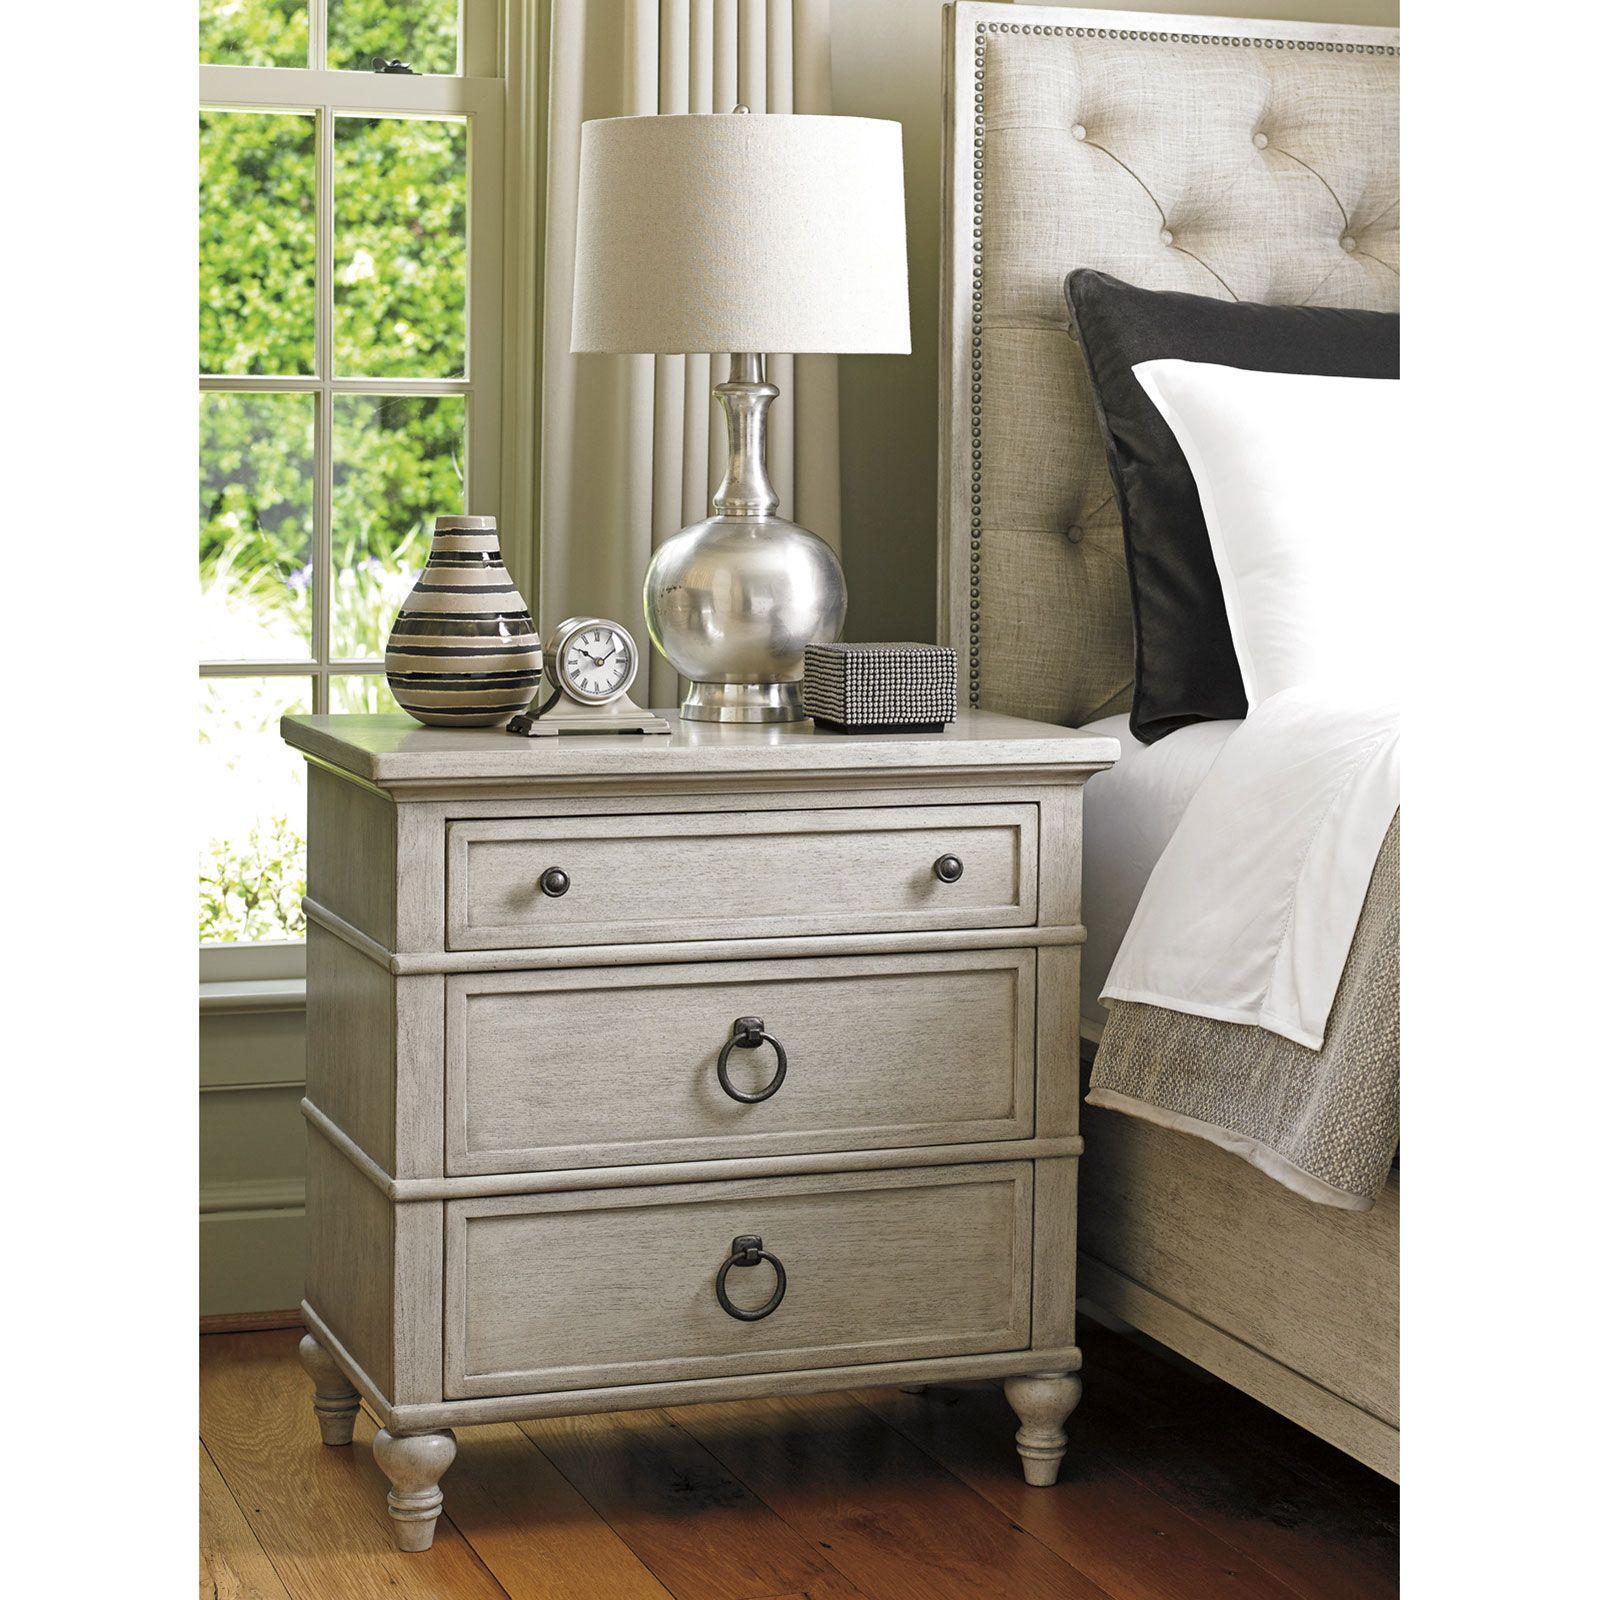 Lexington Cedarhurst Modern 3 Drawer Turned Legs Whitewash Wood Nightstand Lexington Furniture Furniture Bedroom Furniture